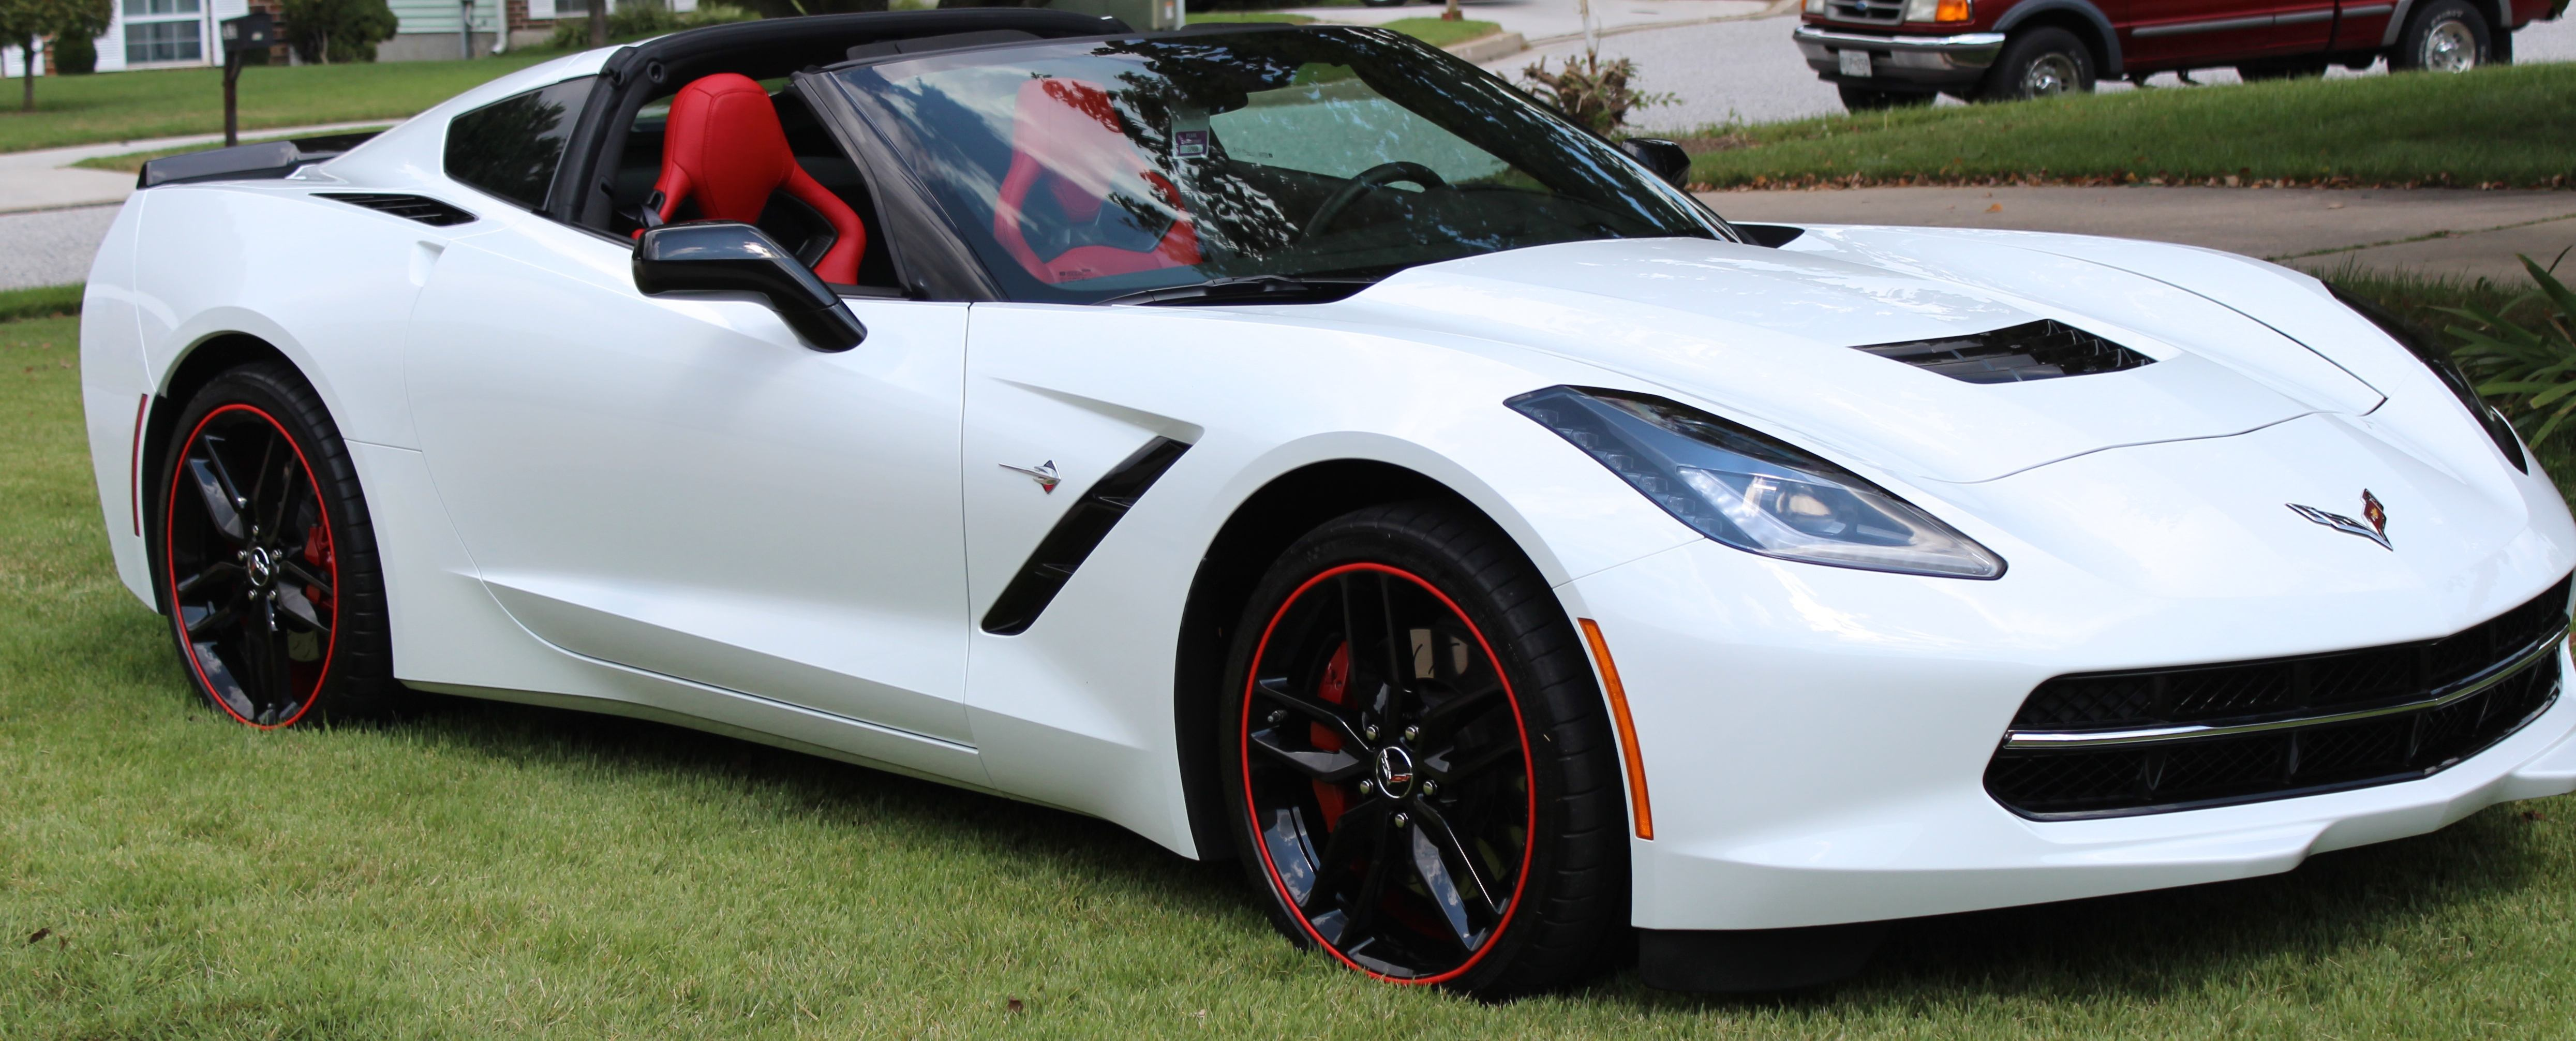 white corvette red rimblades - 2016 Corvette Stingray And Z06 Spice Red Design Package